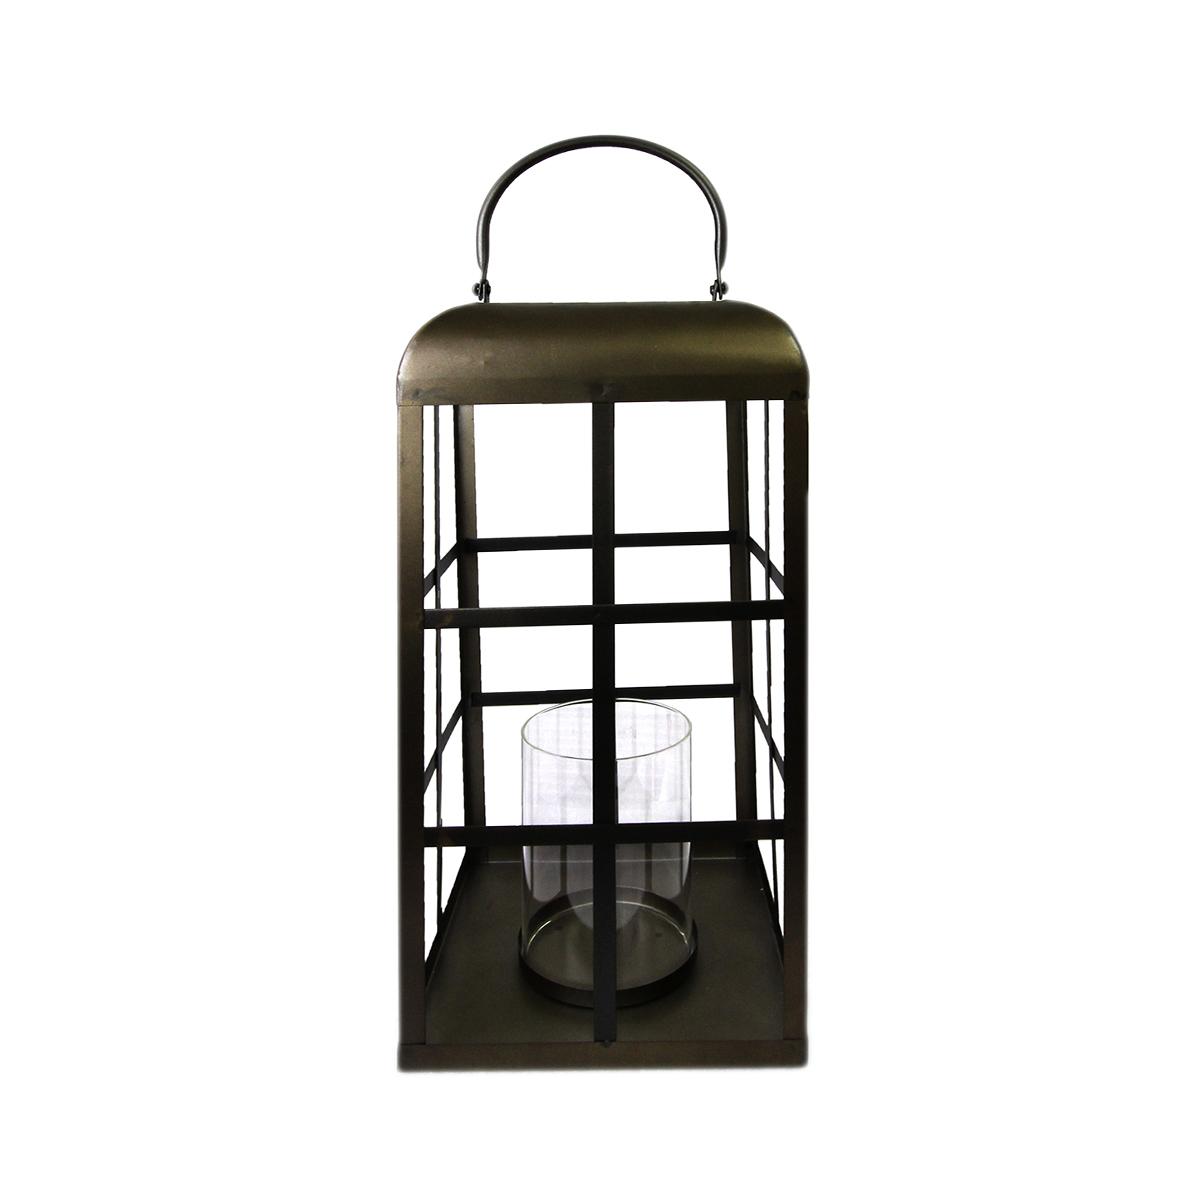 Lanterna metal marrom vidro transparente 16,5x16x5x41cm BTC